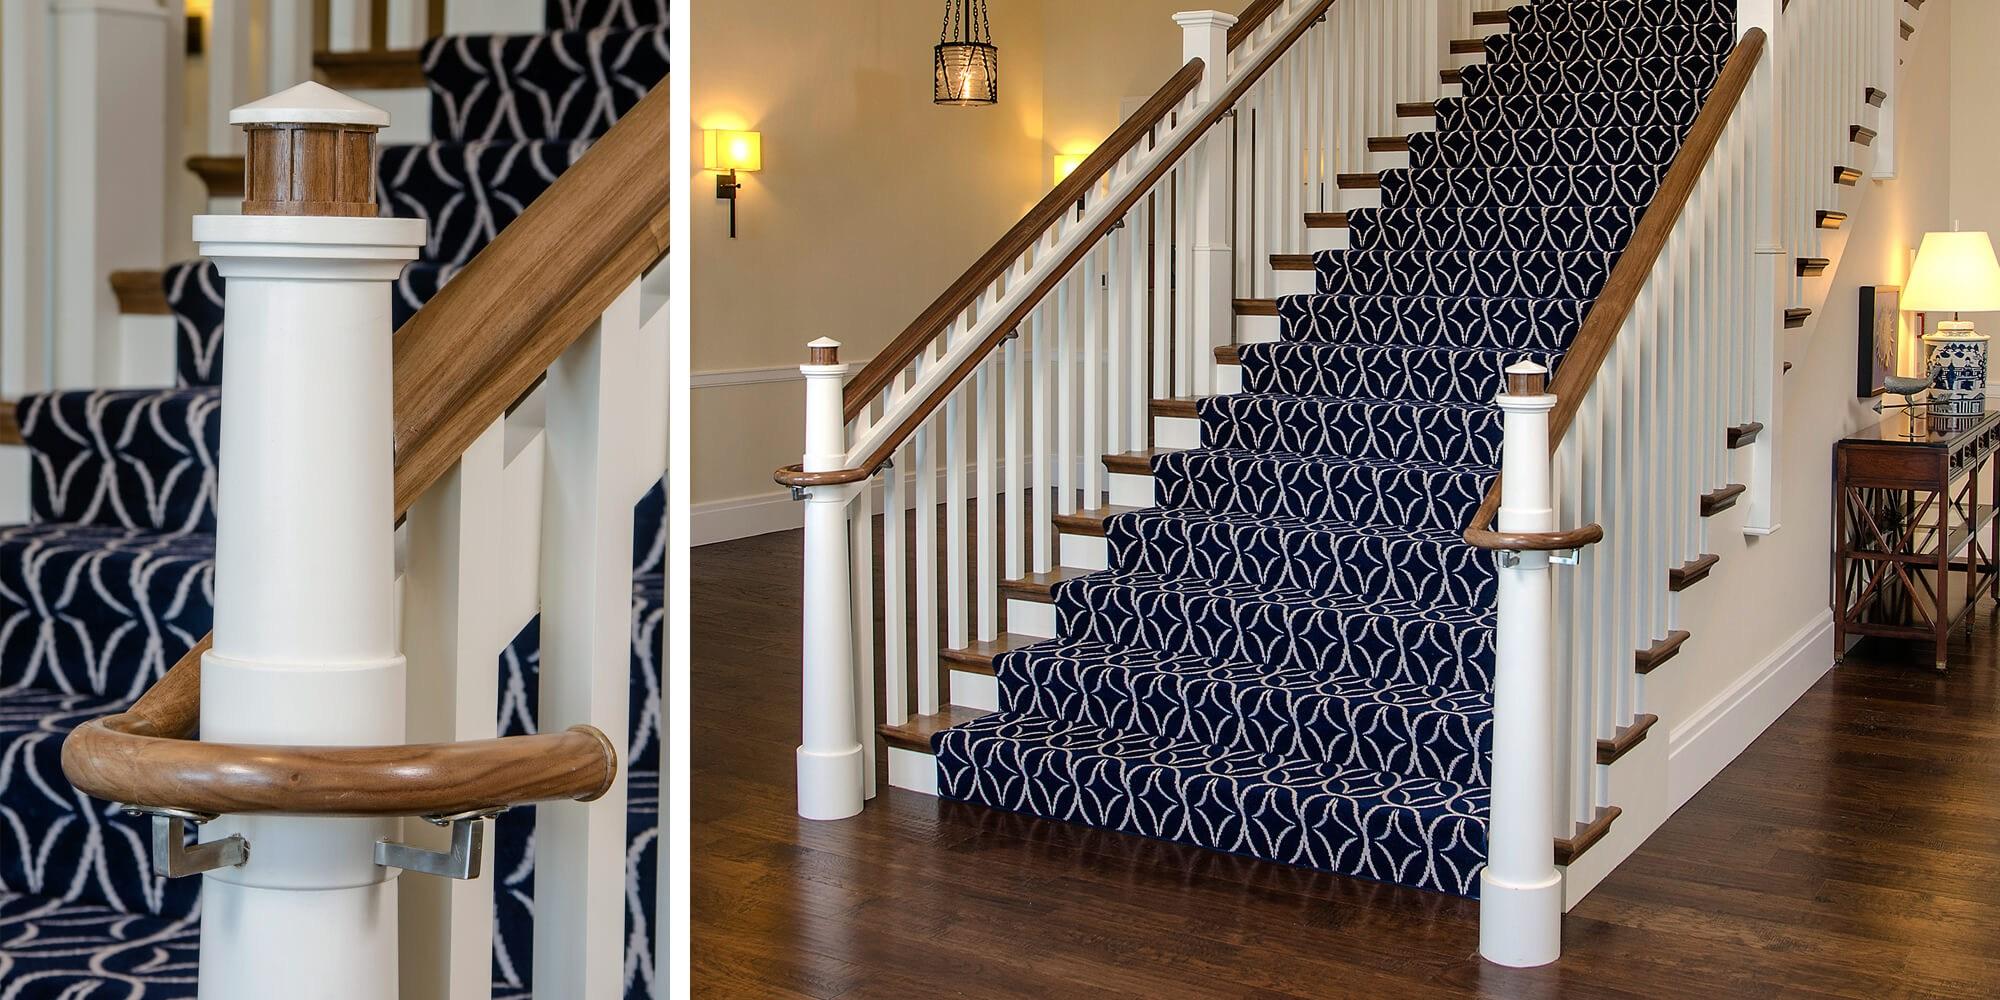 Custom Newel Post Roundup – Horner Millwork | Turned Newel Post Designs | Type | Spiral | Round | Wood Baluster | Black